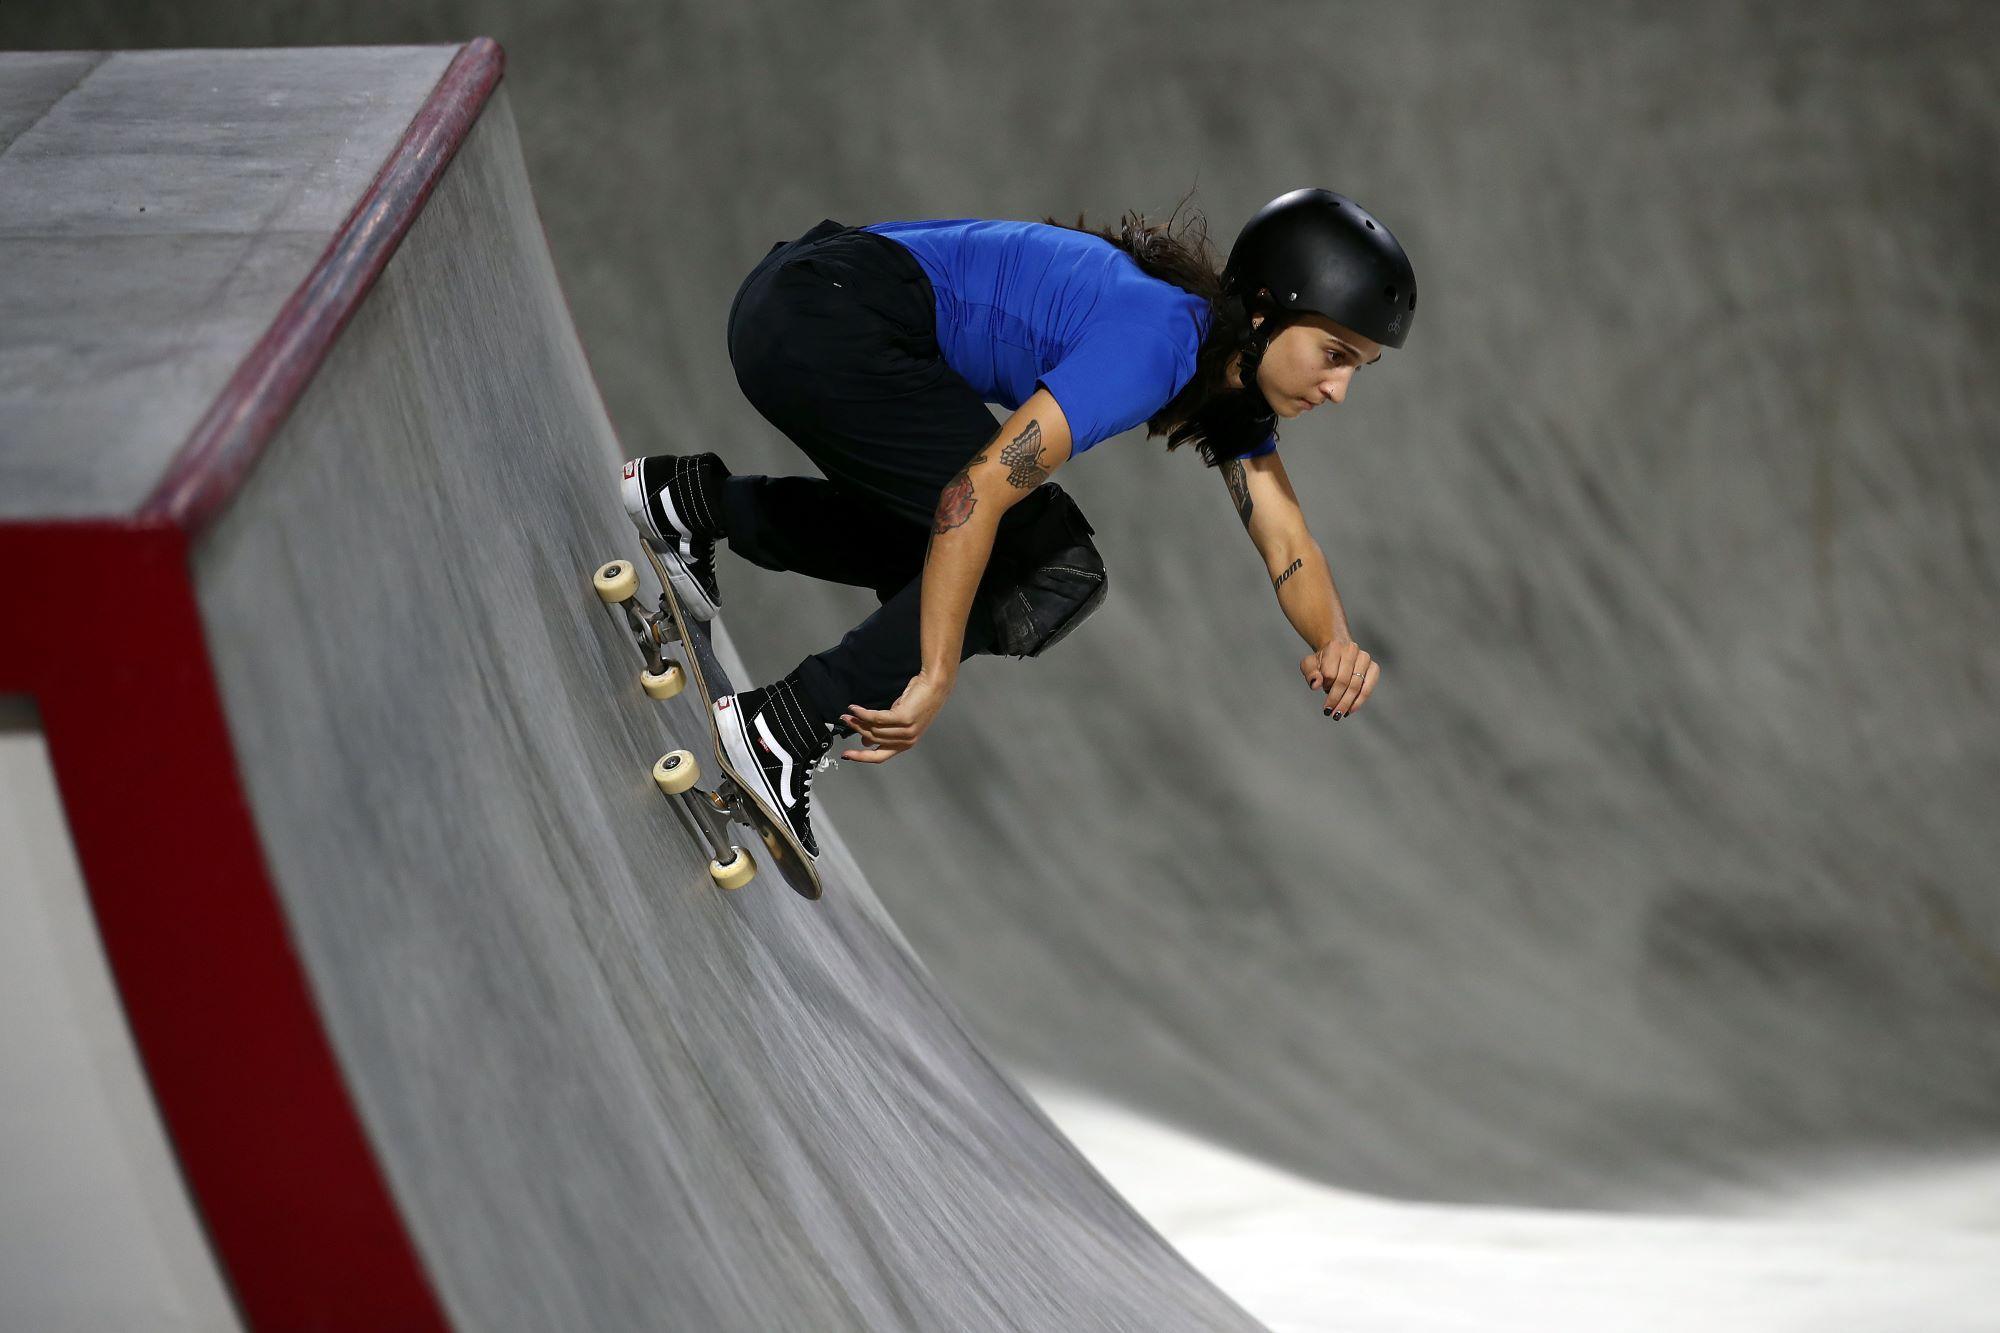 Skateuse en pleine descente de rampe.